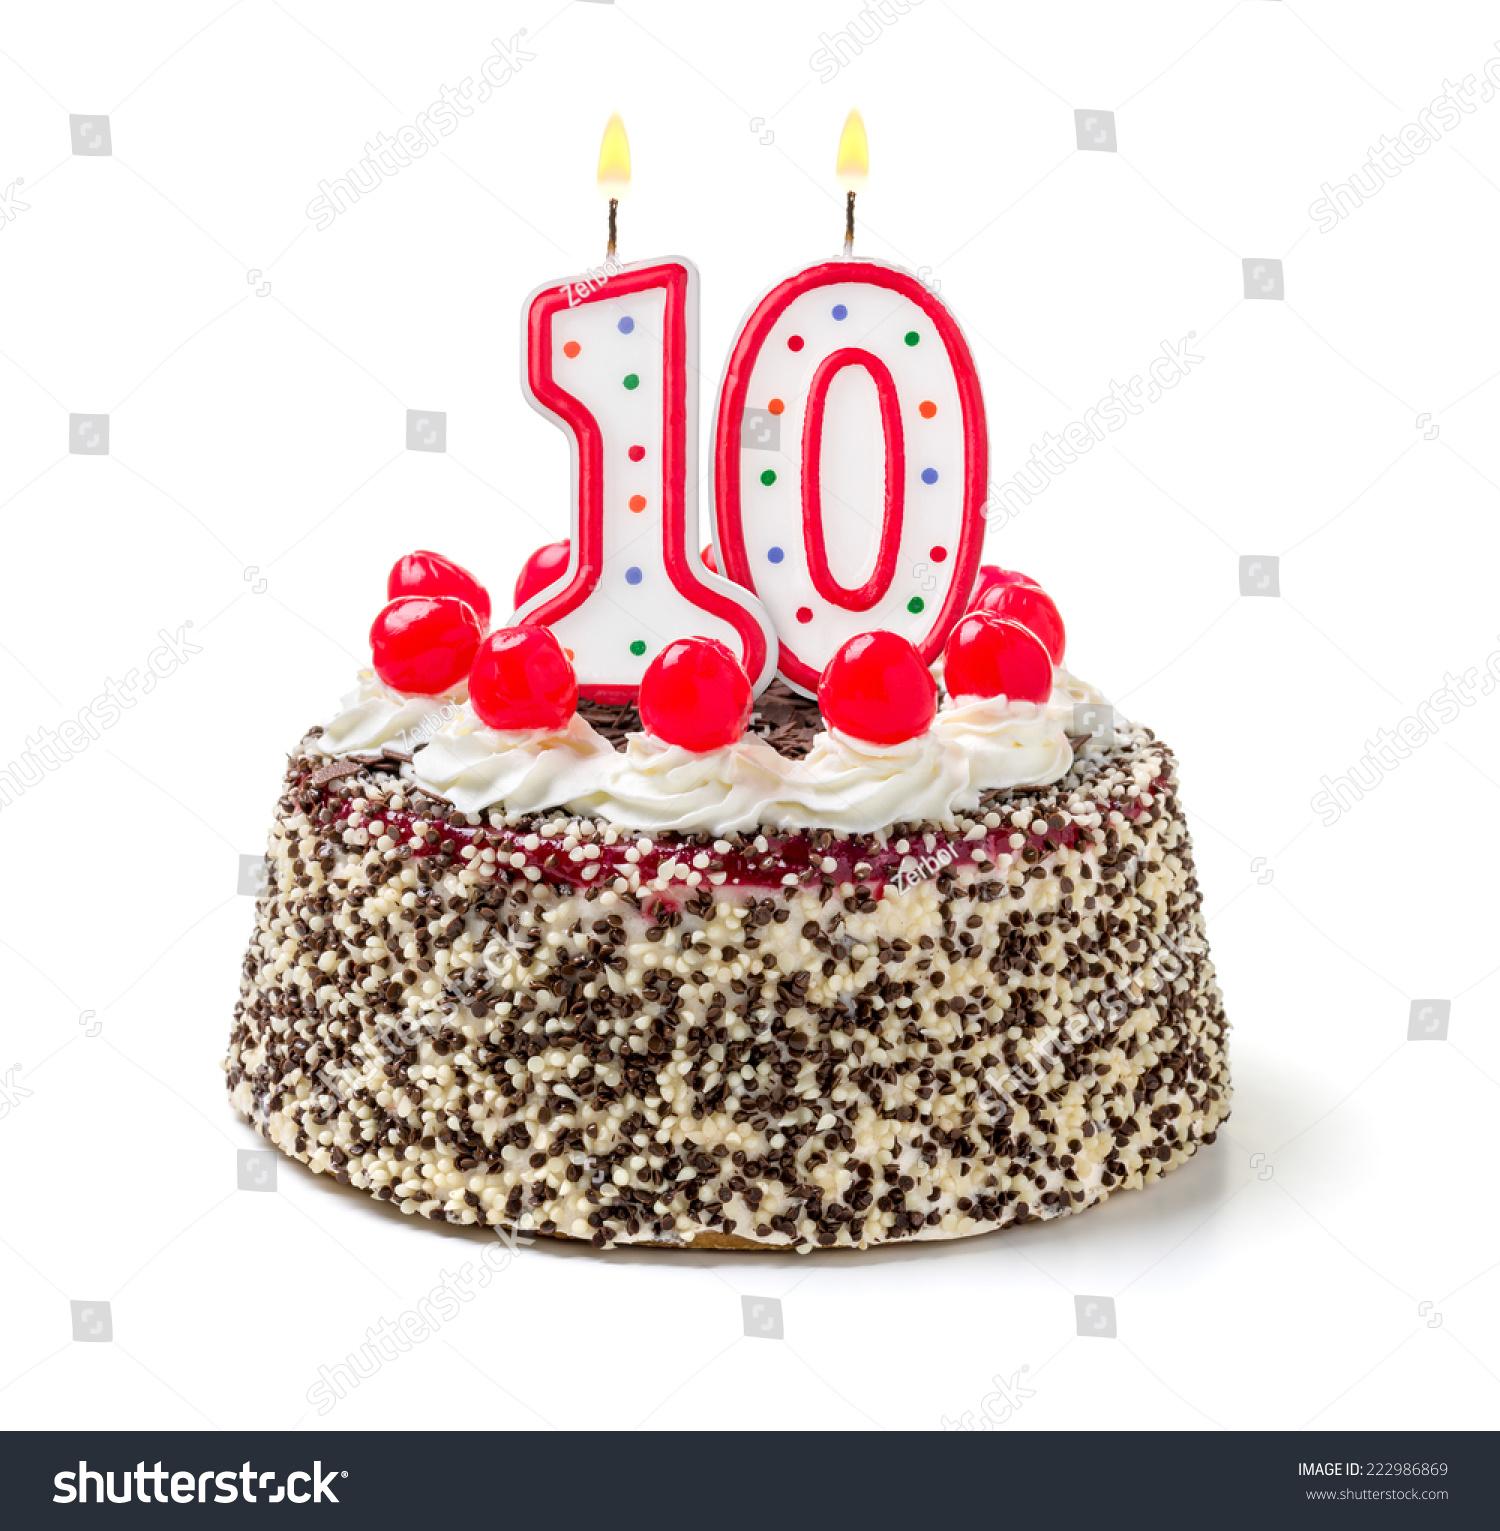 10 birthday cake